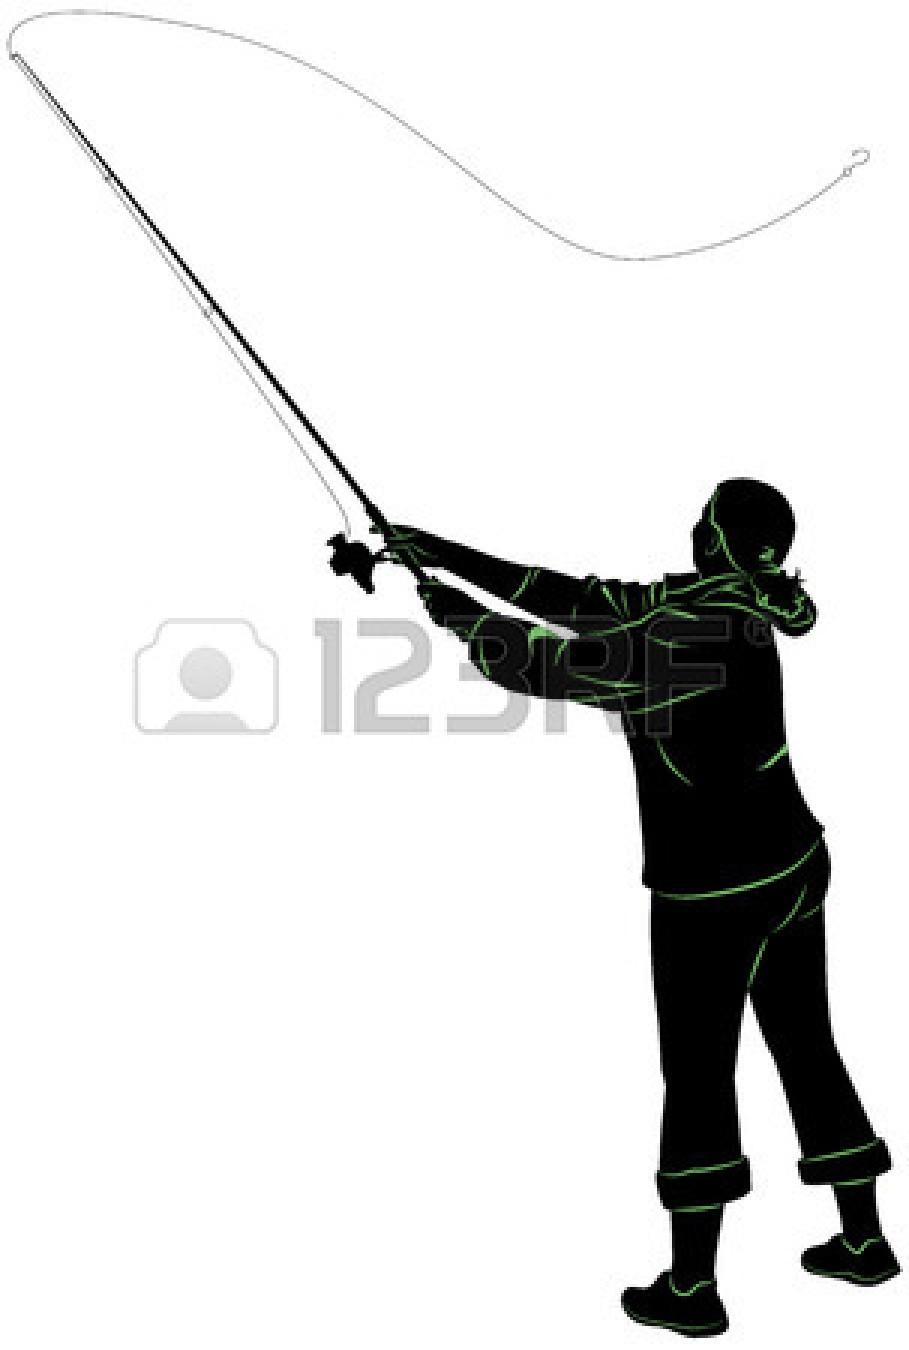 909x1350 Fishing Pole Silhouette Clipart Panda